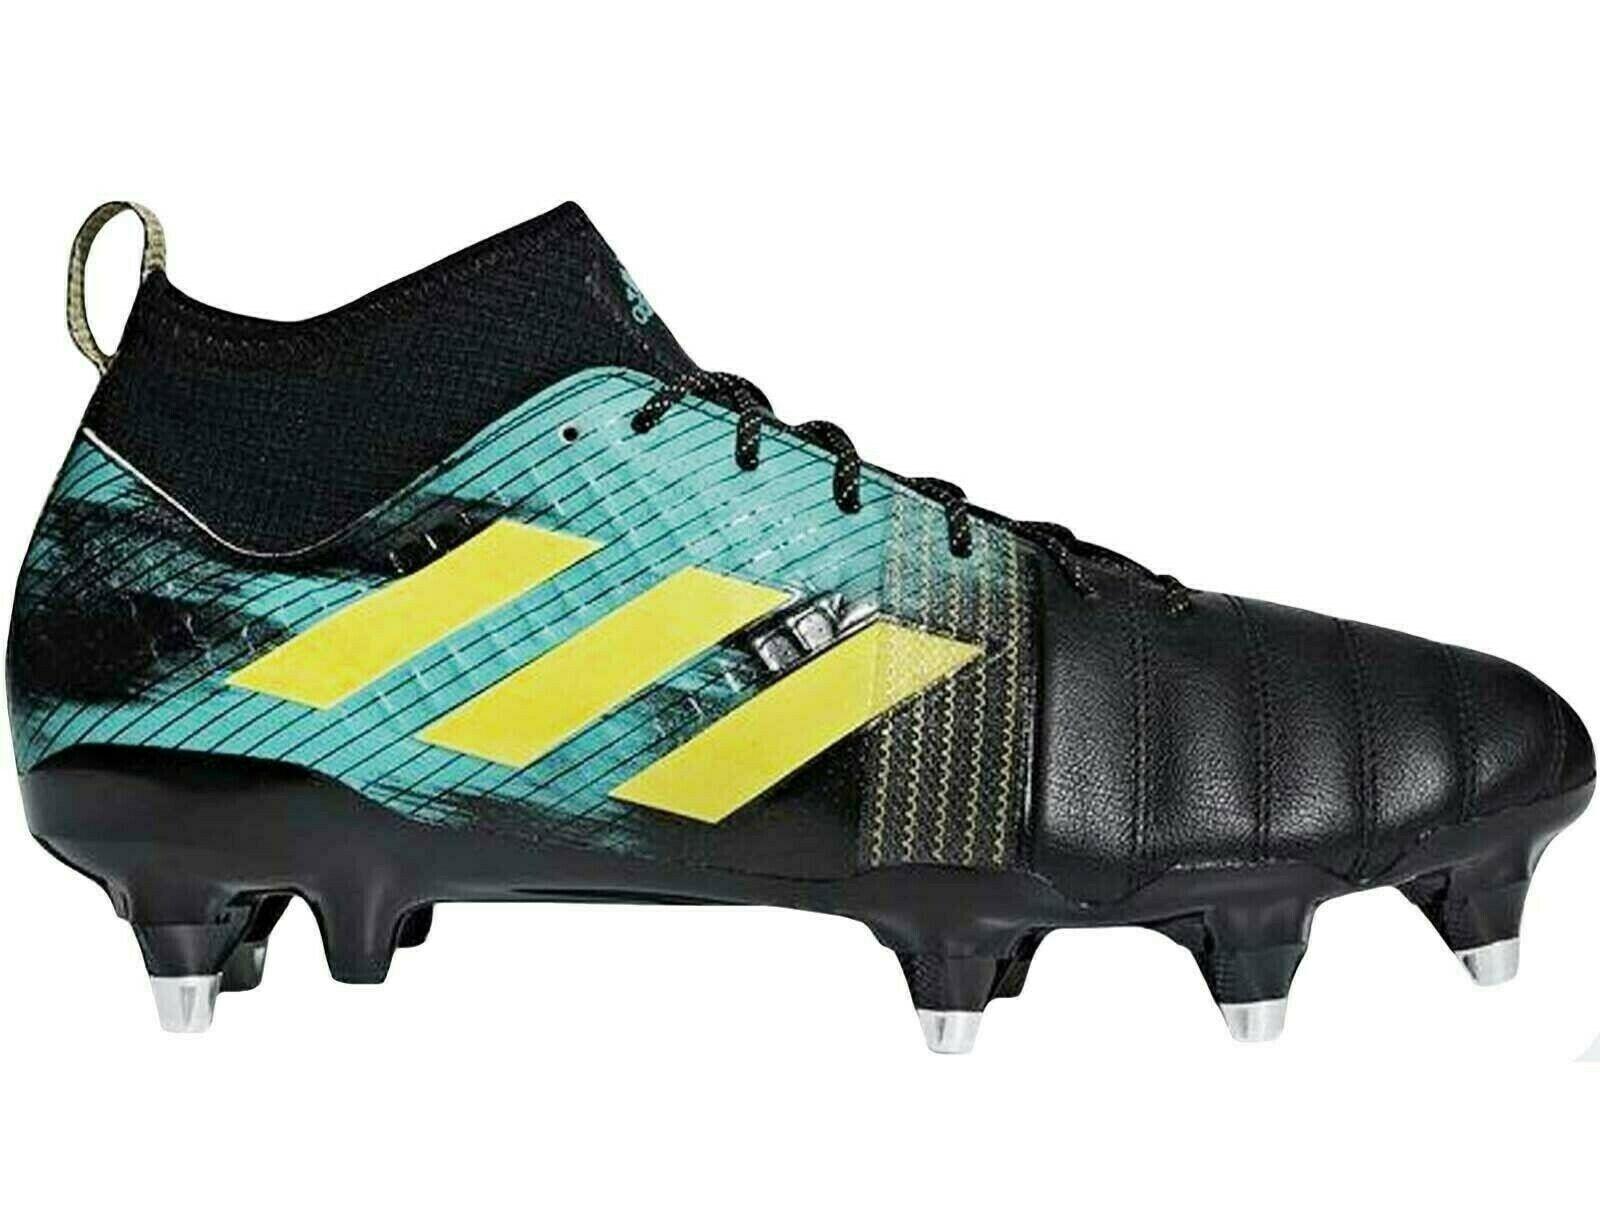 Adidas Performance Homme Kakari X Kevlar SG Rugby Entraînement Chaussure Bottes Noir Uk 11